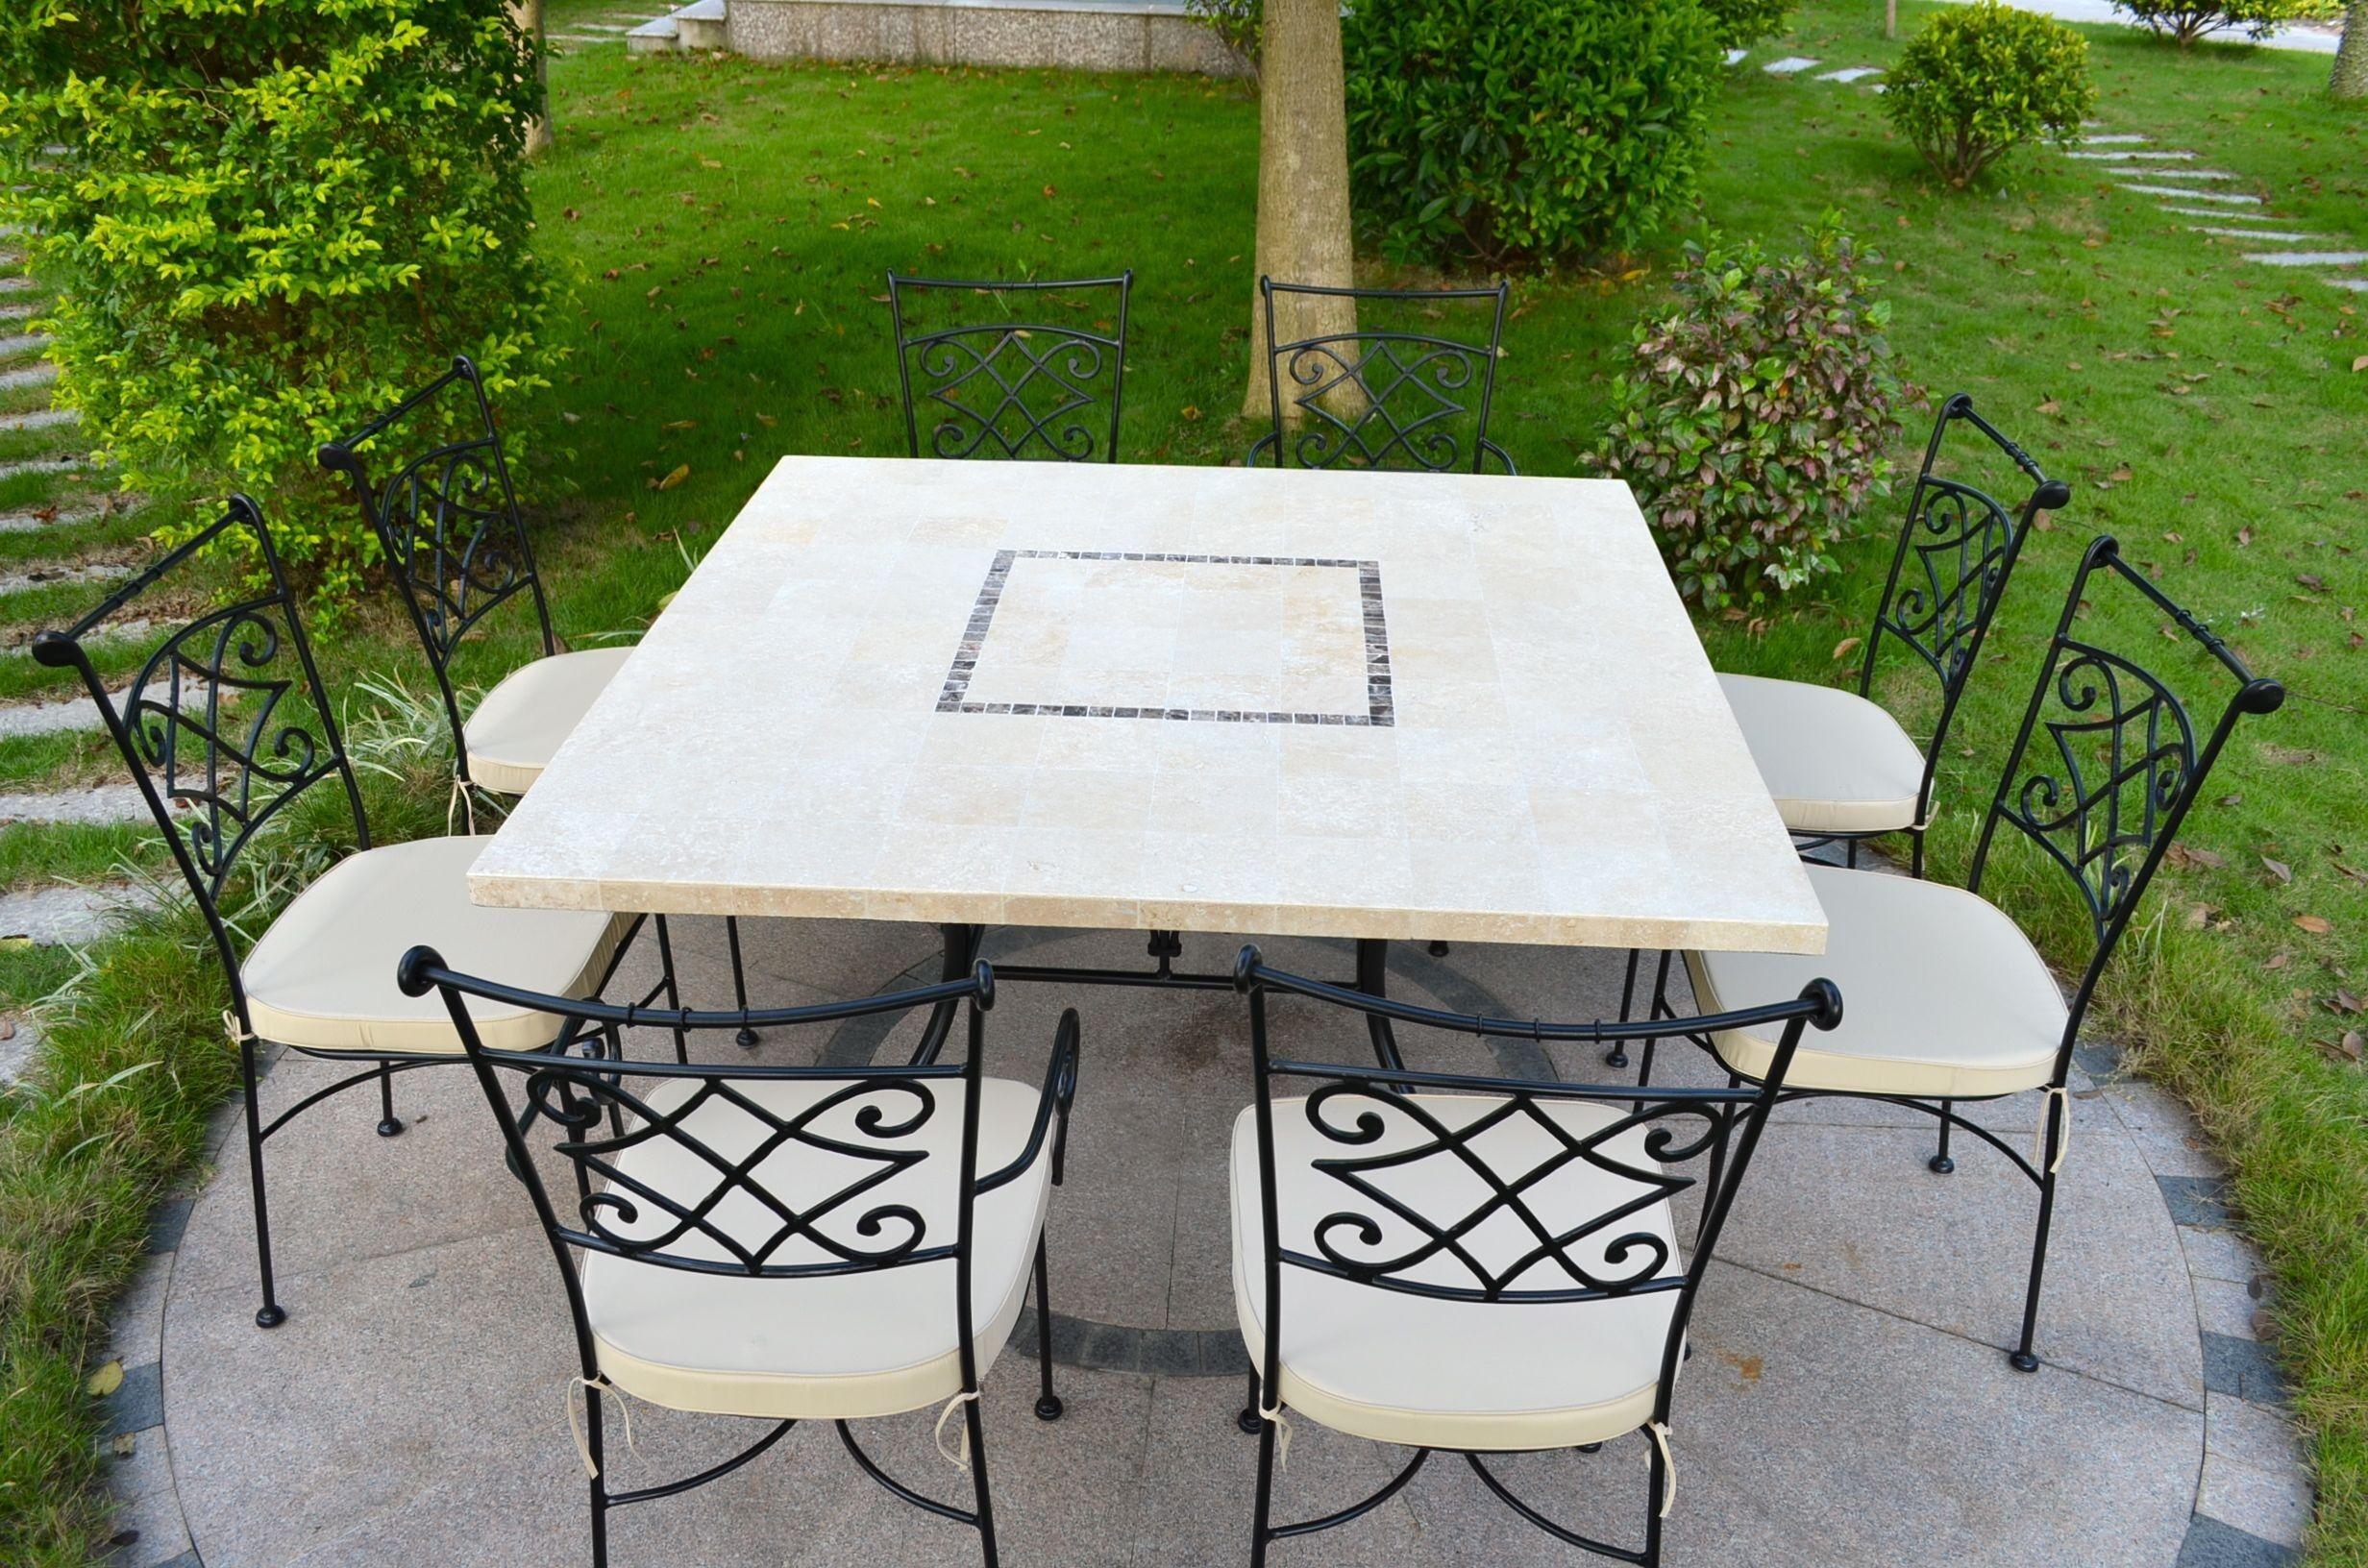 LivingRoc Table de jardin en pierre mosaique de Travertin carree 140 CAPRI